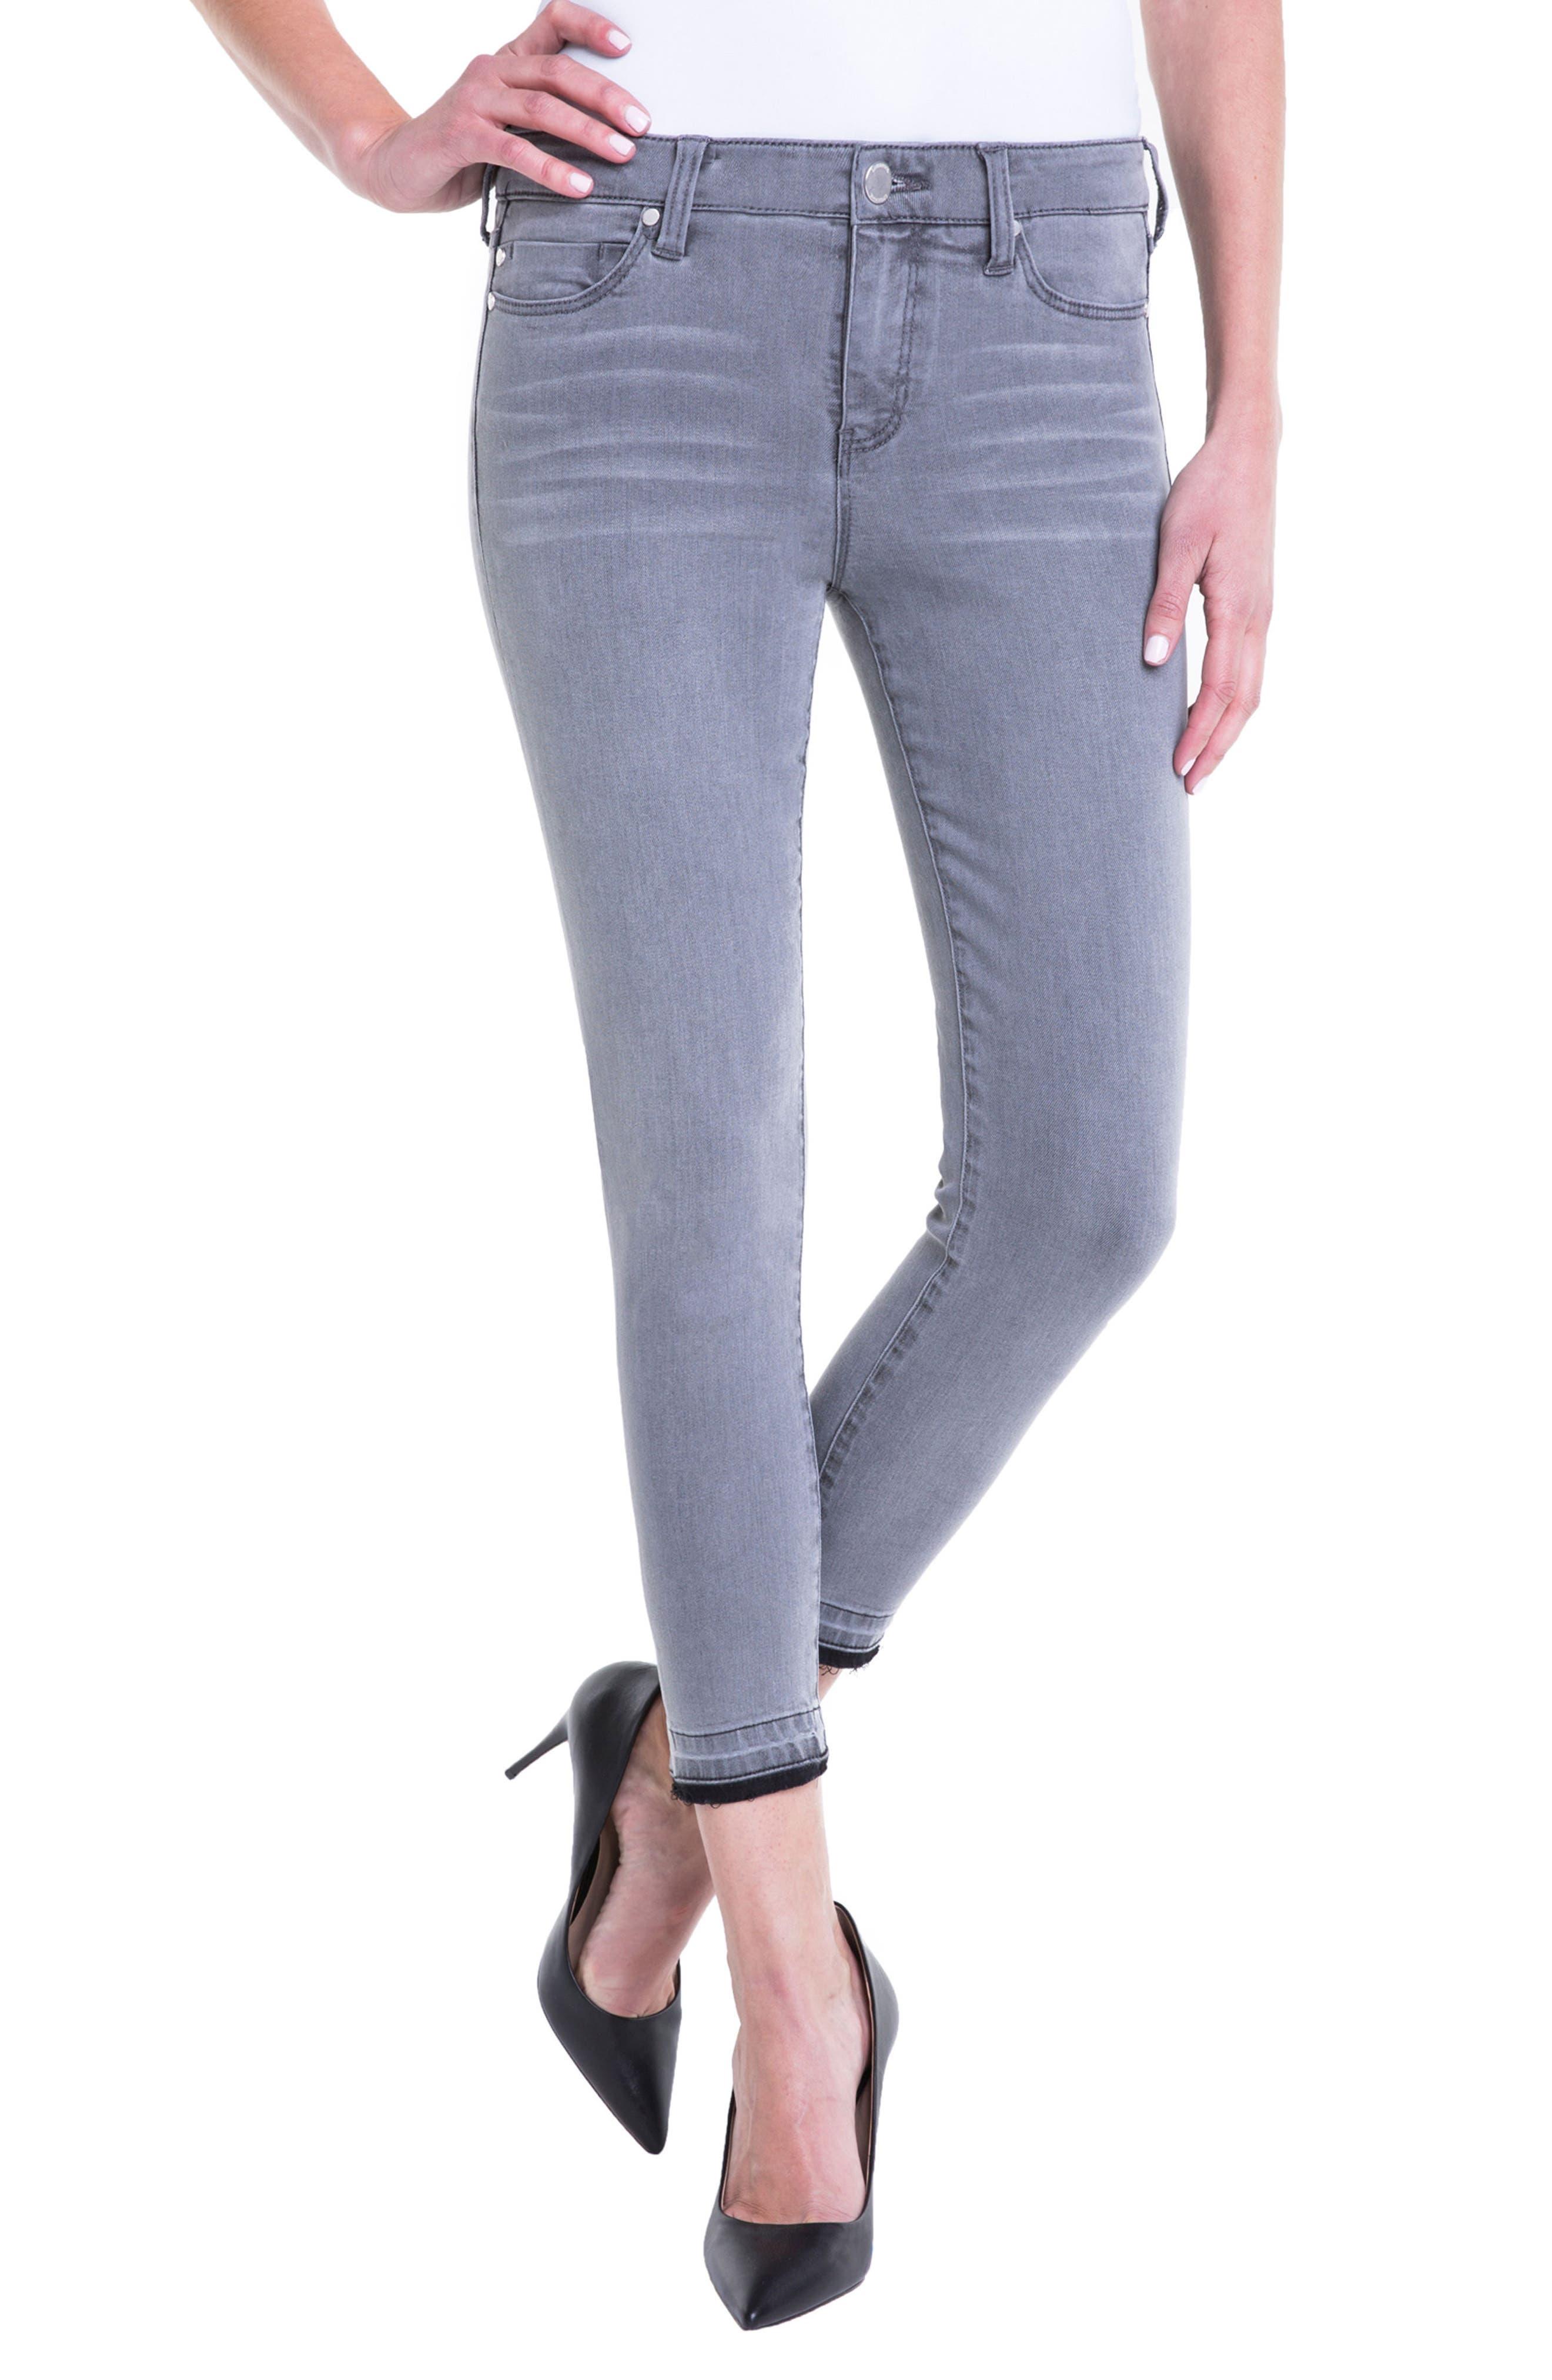 Avery Release Hem Crop Jeans,                         Main,                         color, Aluminum Wash